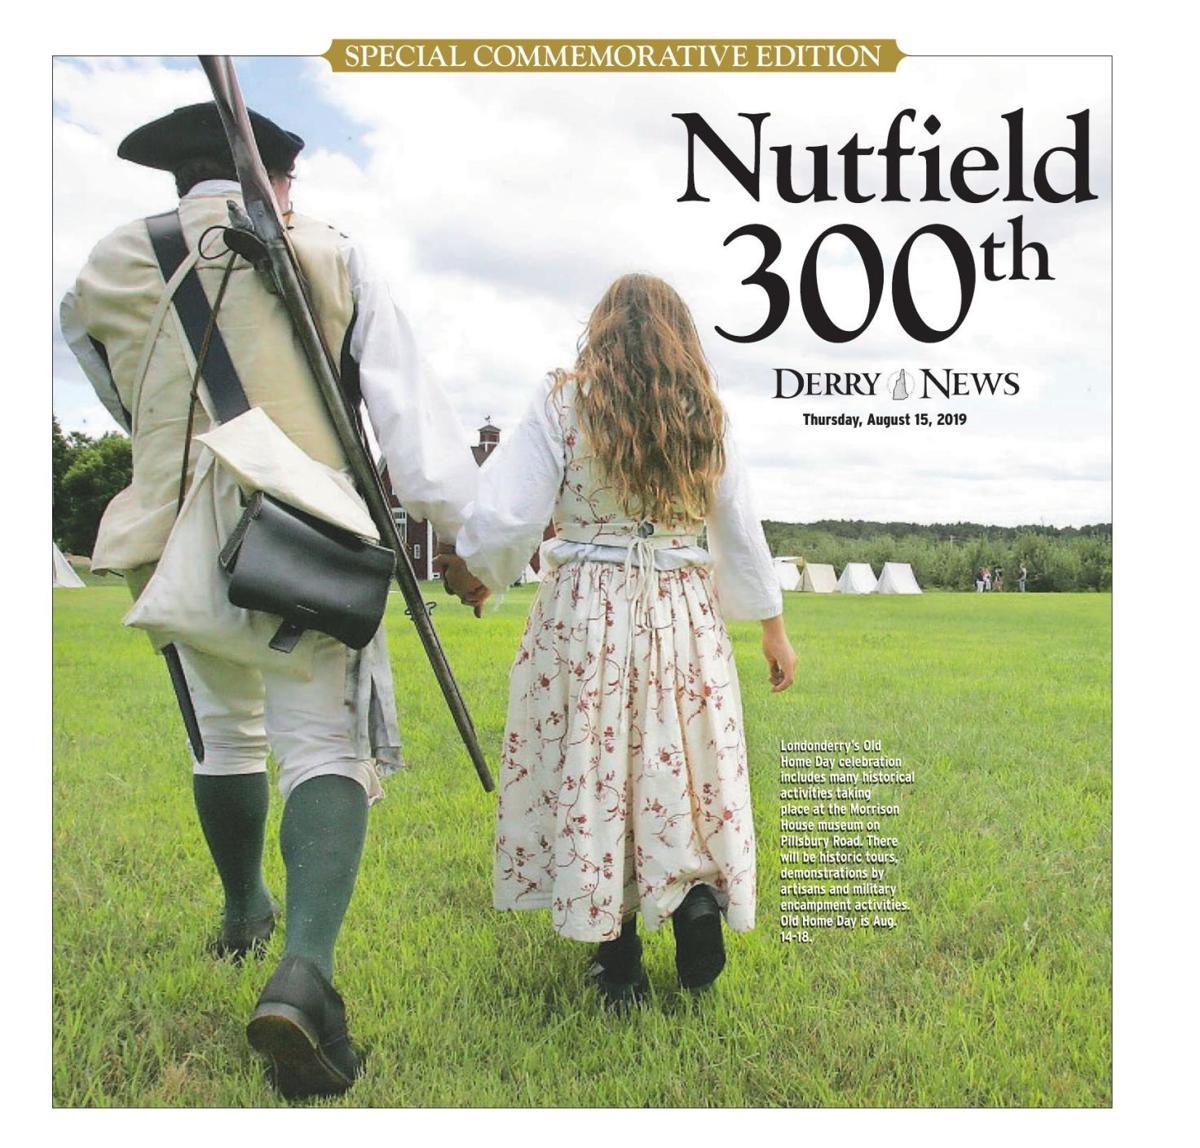 Nutfield 300th